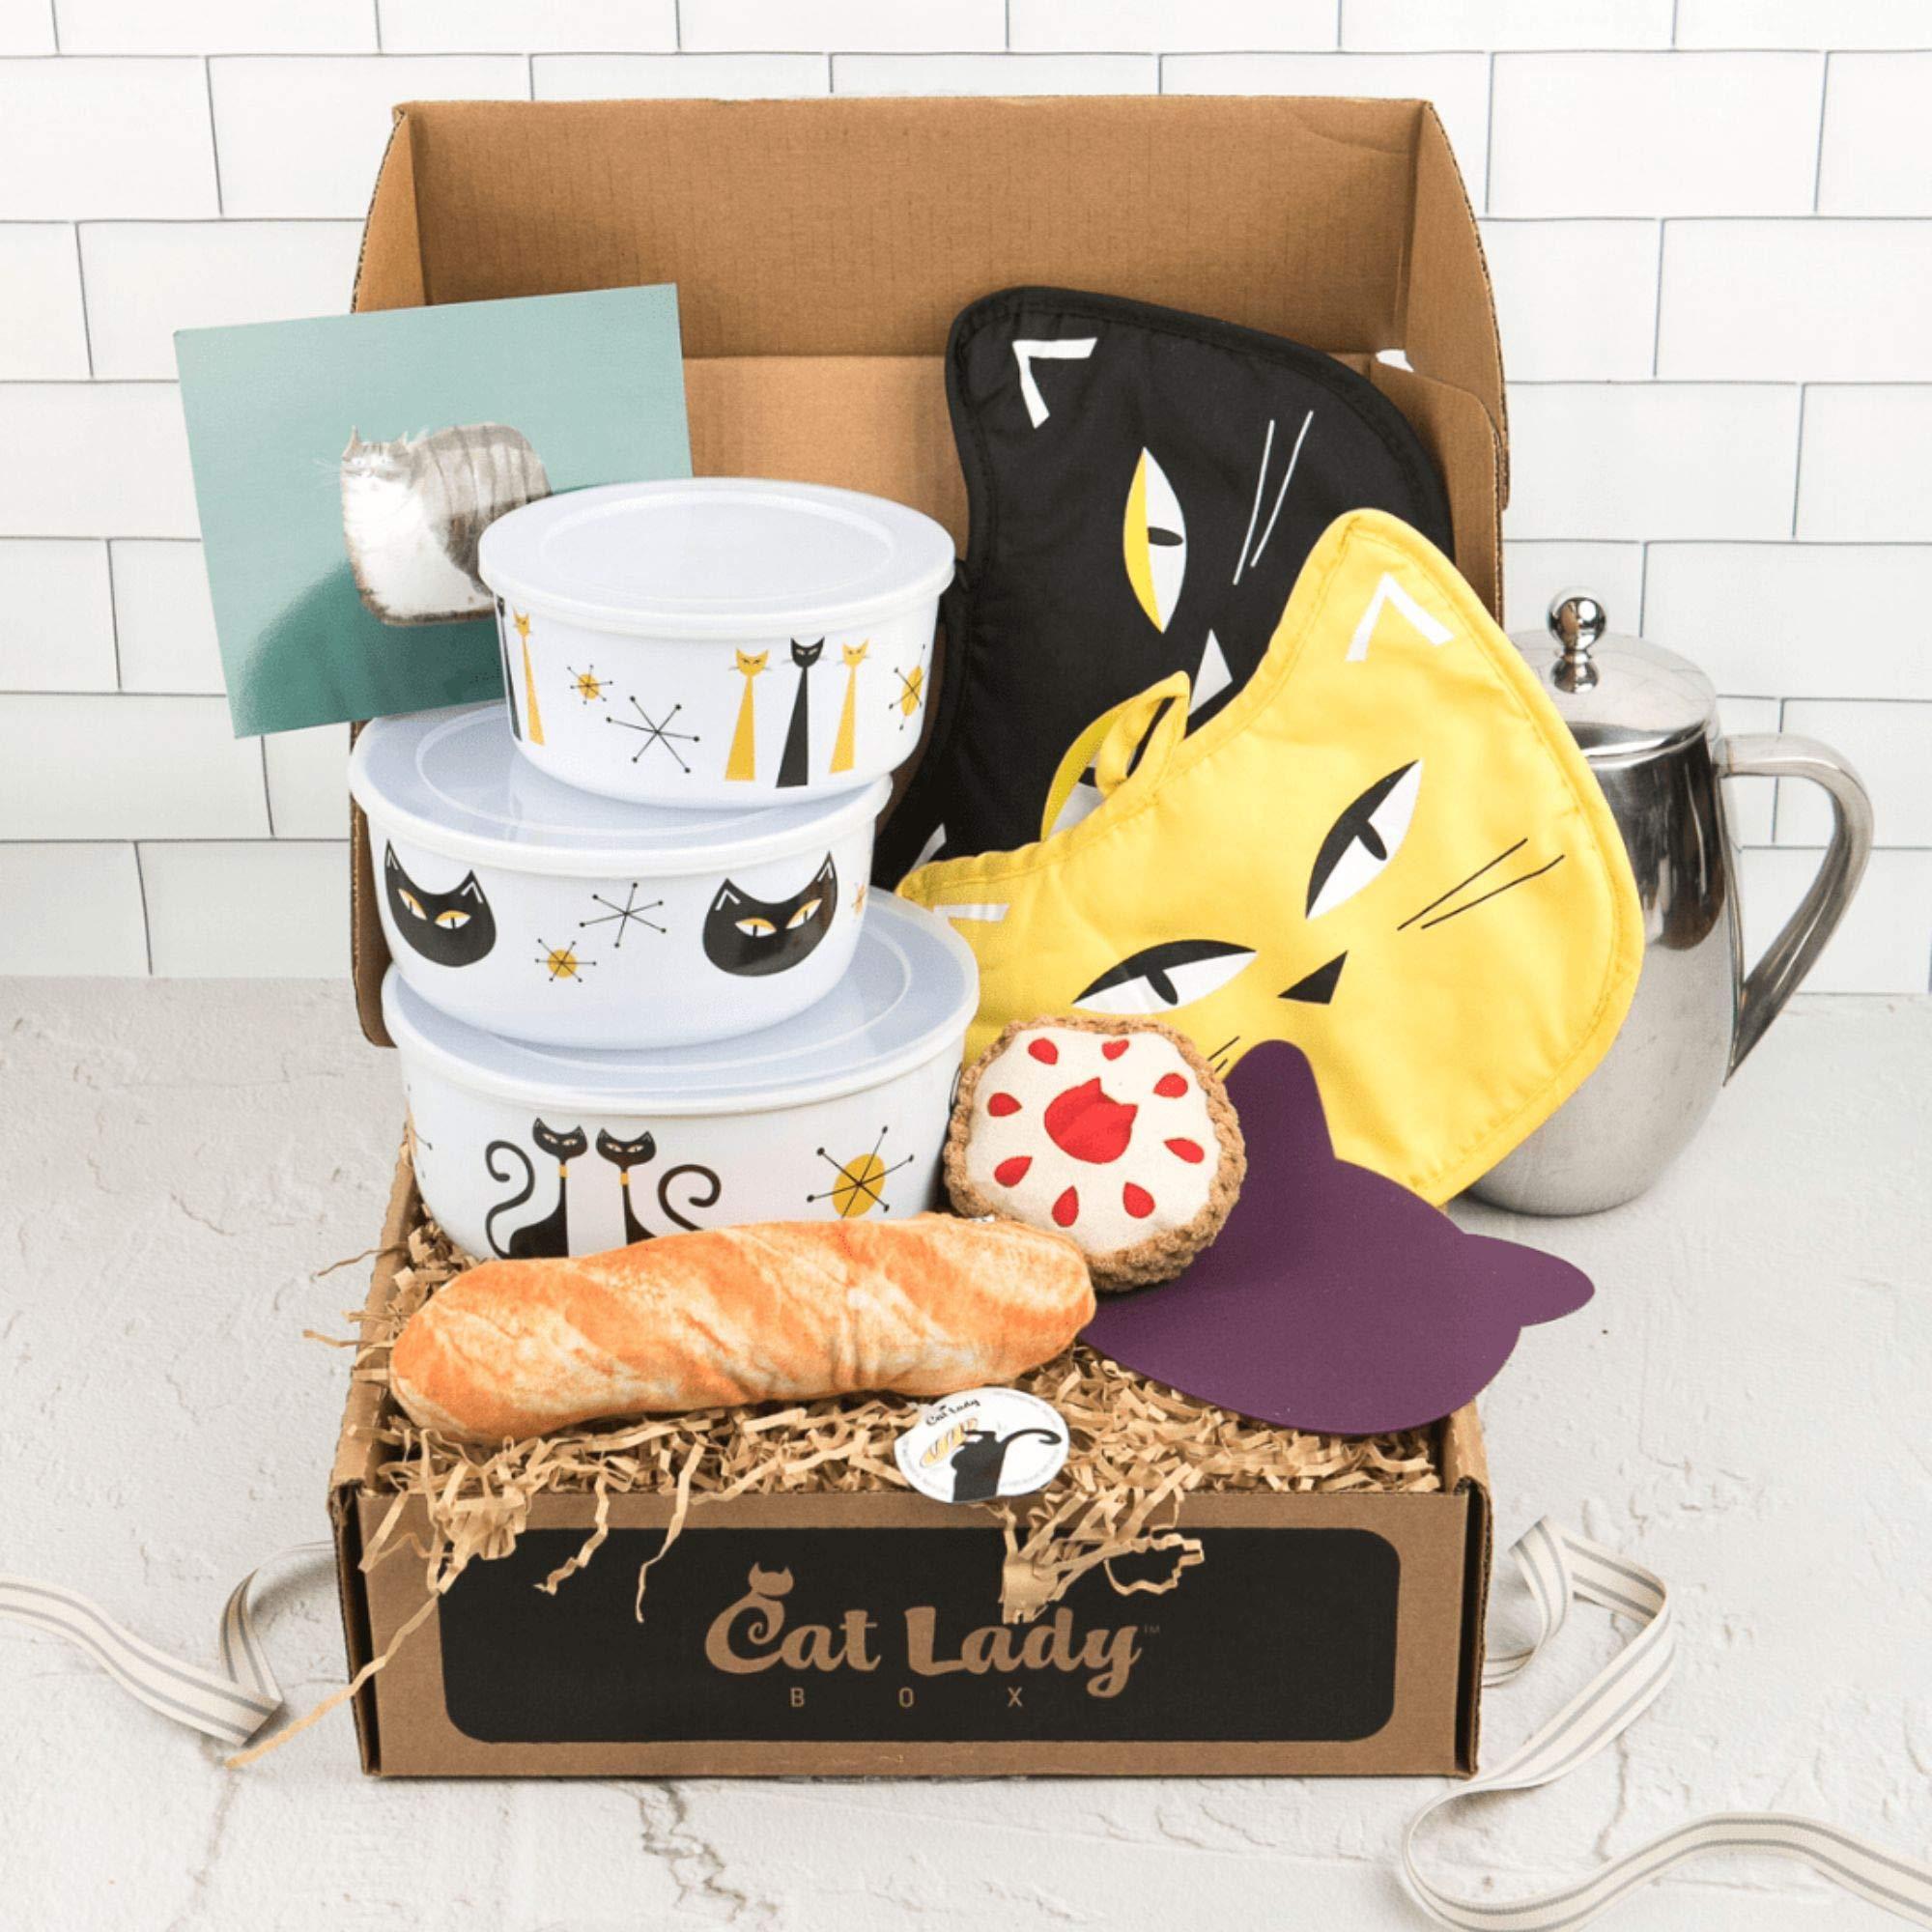 CatLadyBox - Subscription Box for Cat Ladies and Cats: Crazy - Medium